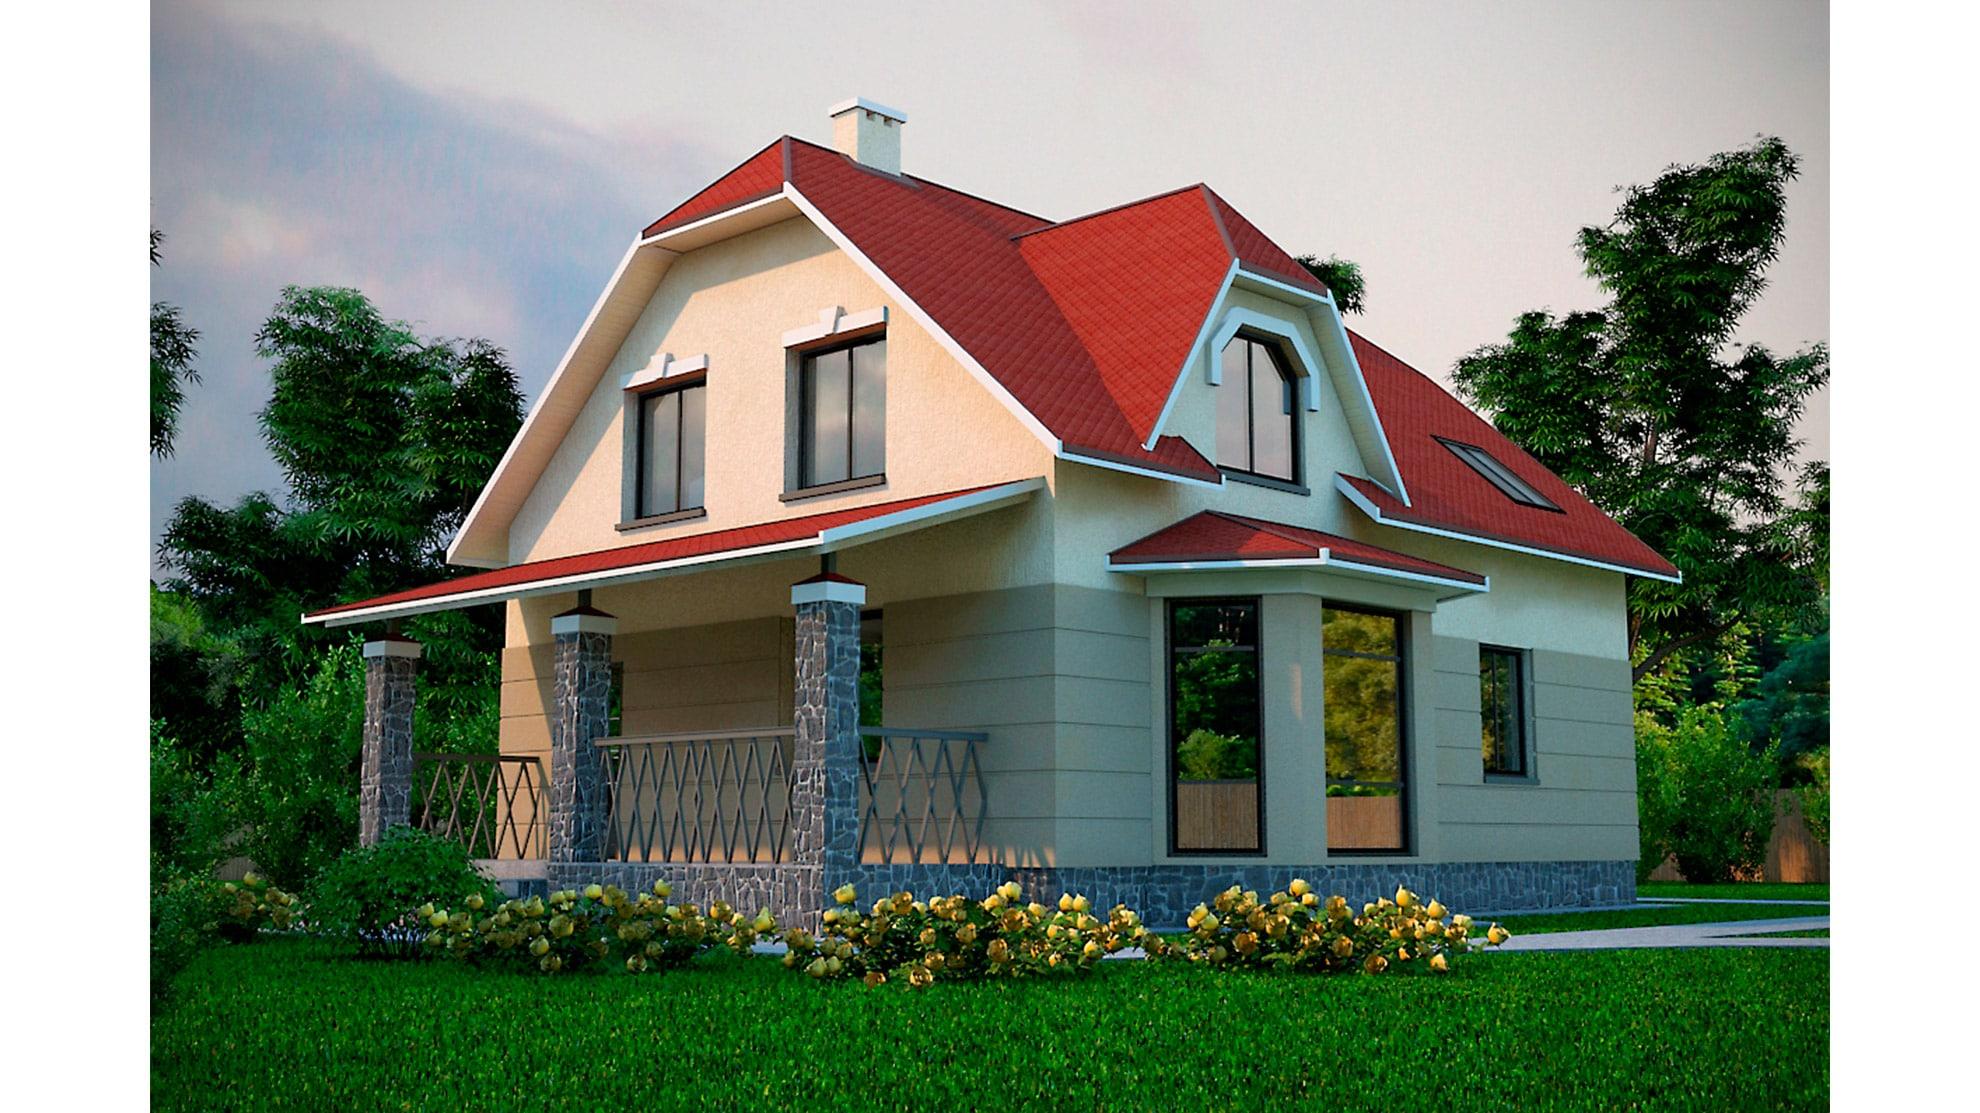 Проект мансардного дома с террасой «КМ-39» - фото №1